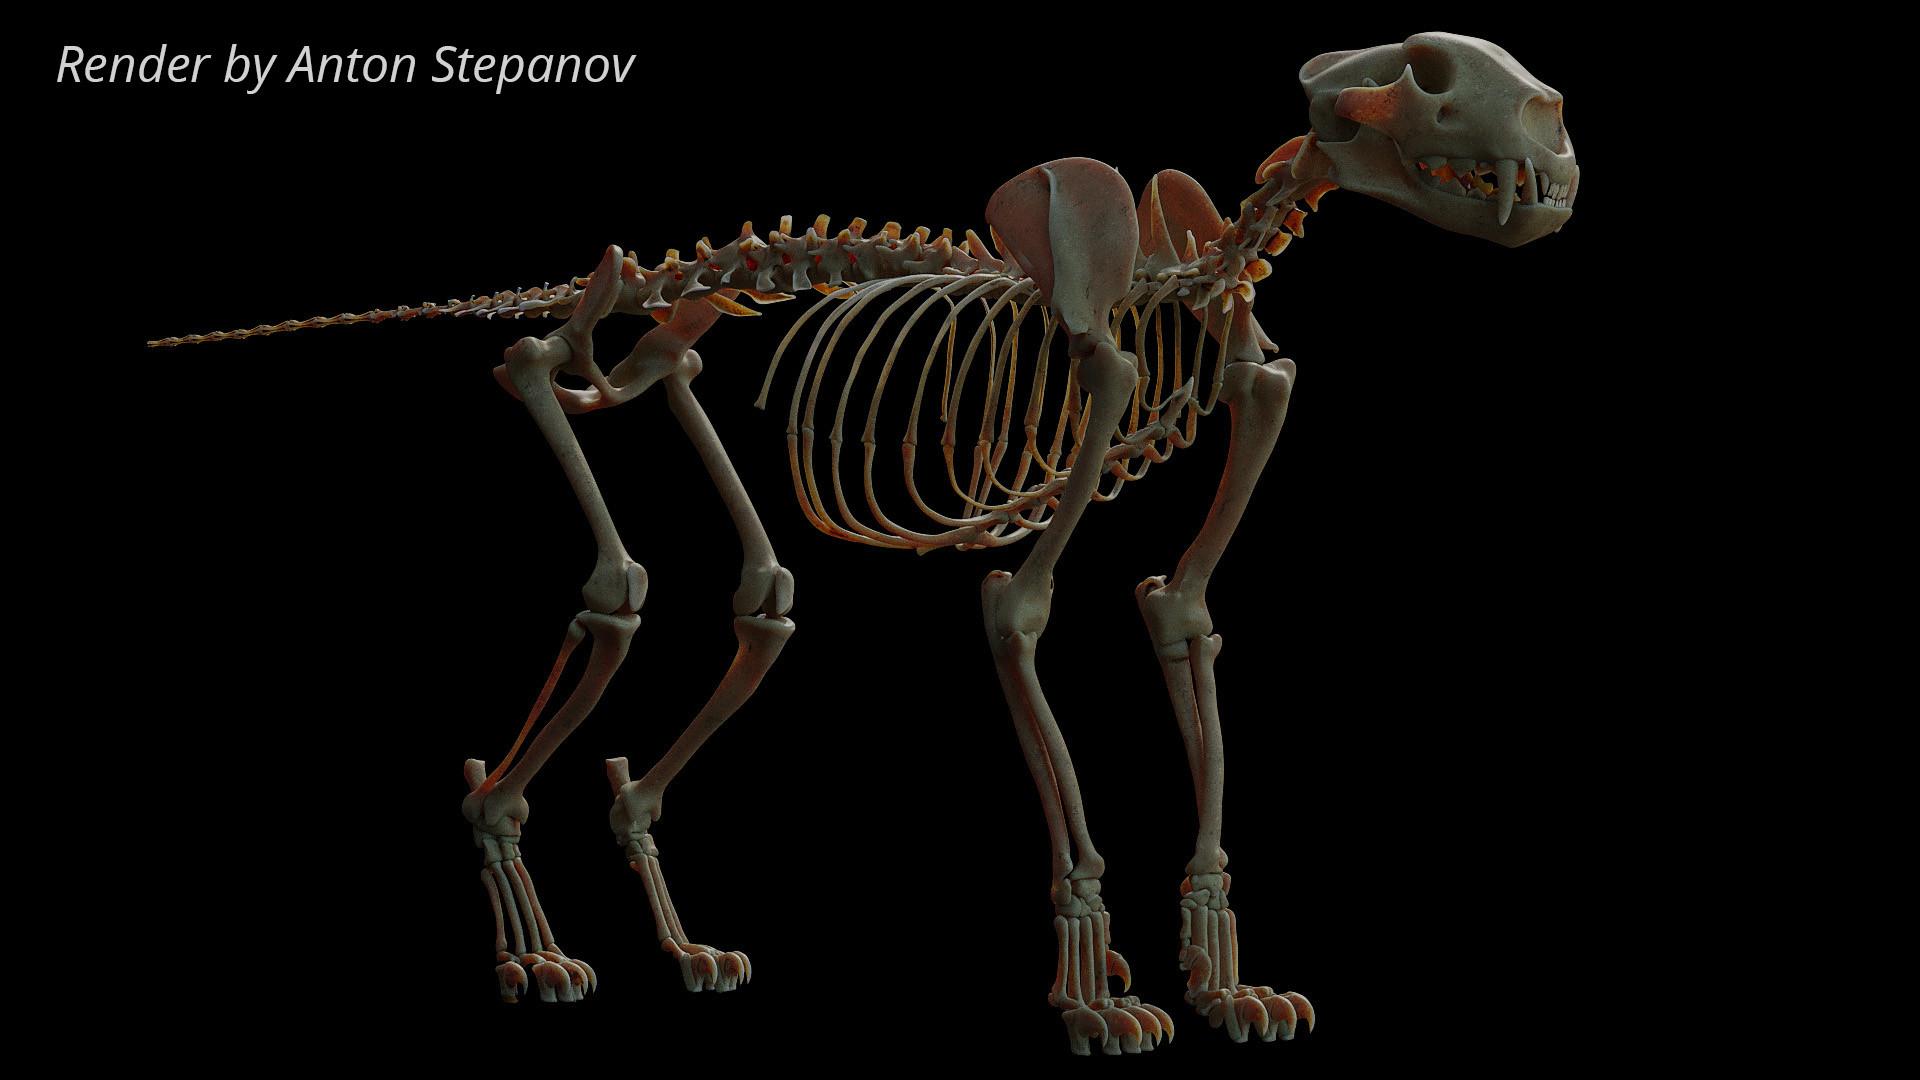 Florian croquet leopardgumrox